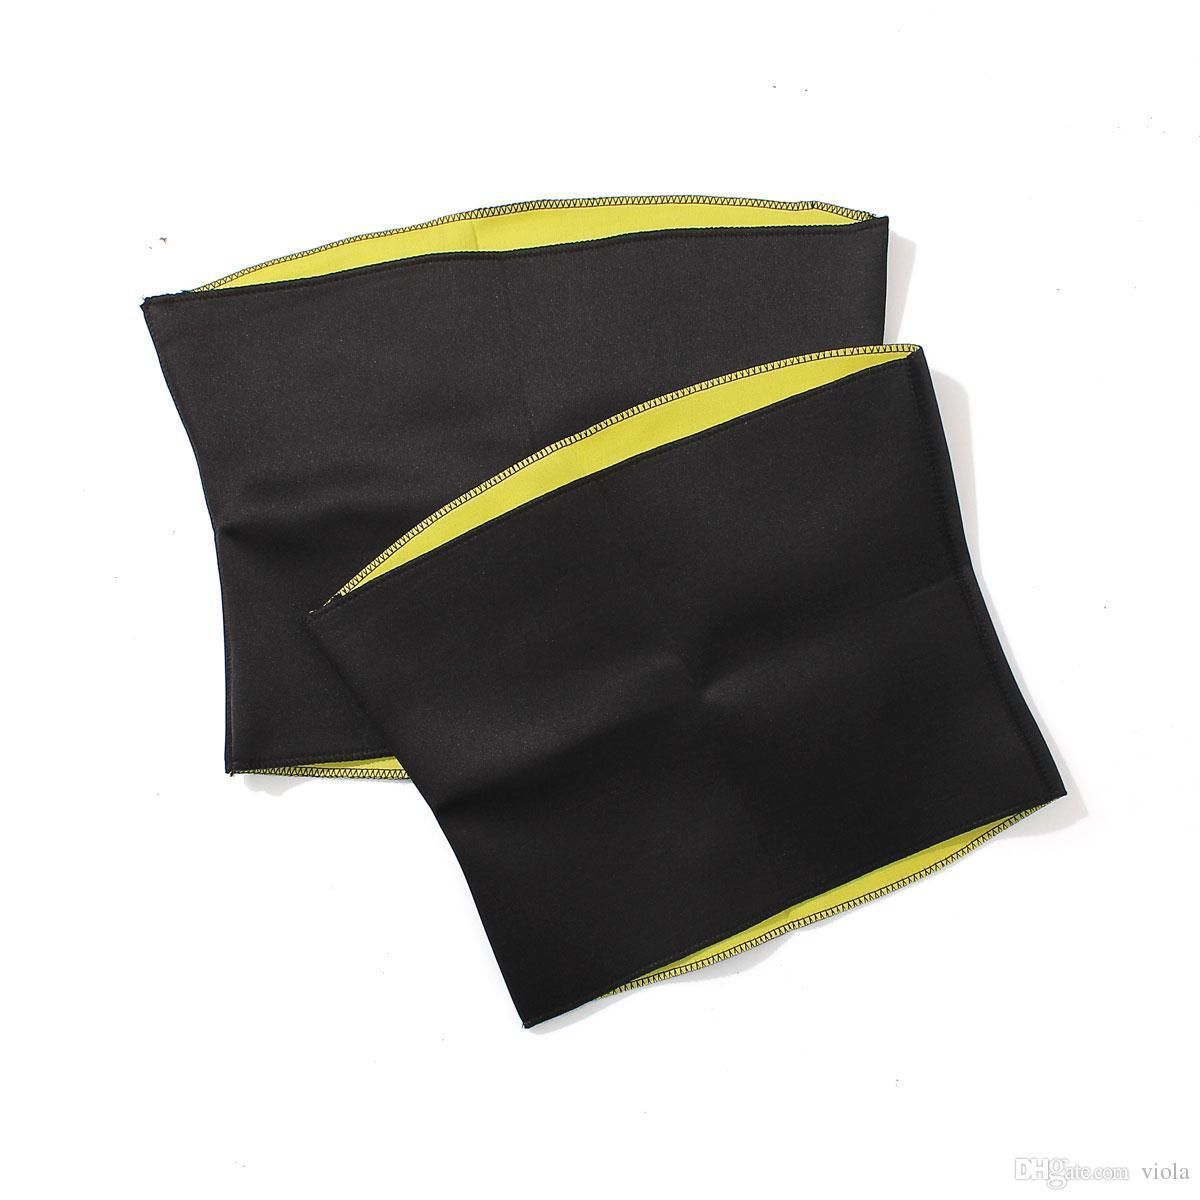 Women Hot Neoprene Body Shaper Slimming Waist Trainer Trimmer Corset Slim Belt Slimming Waist Trainer Cincher Yoga Belt